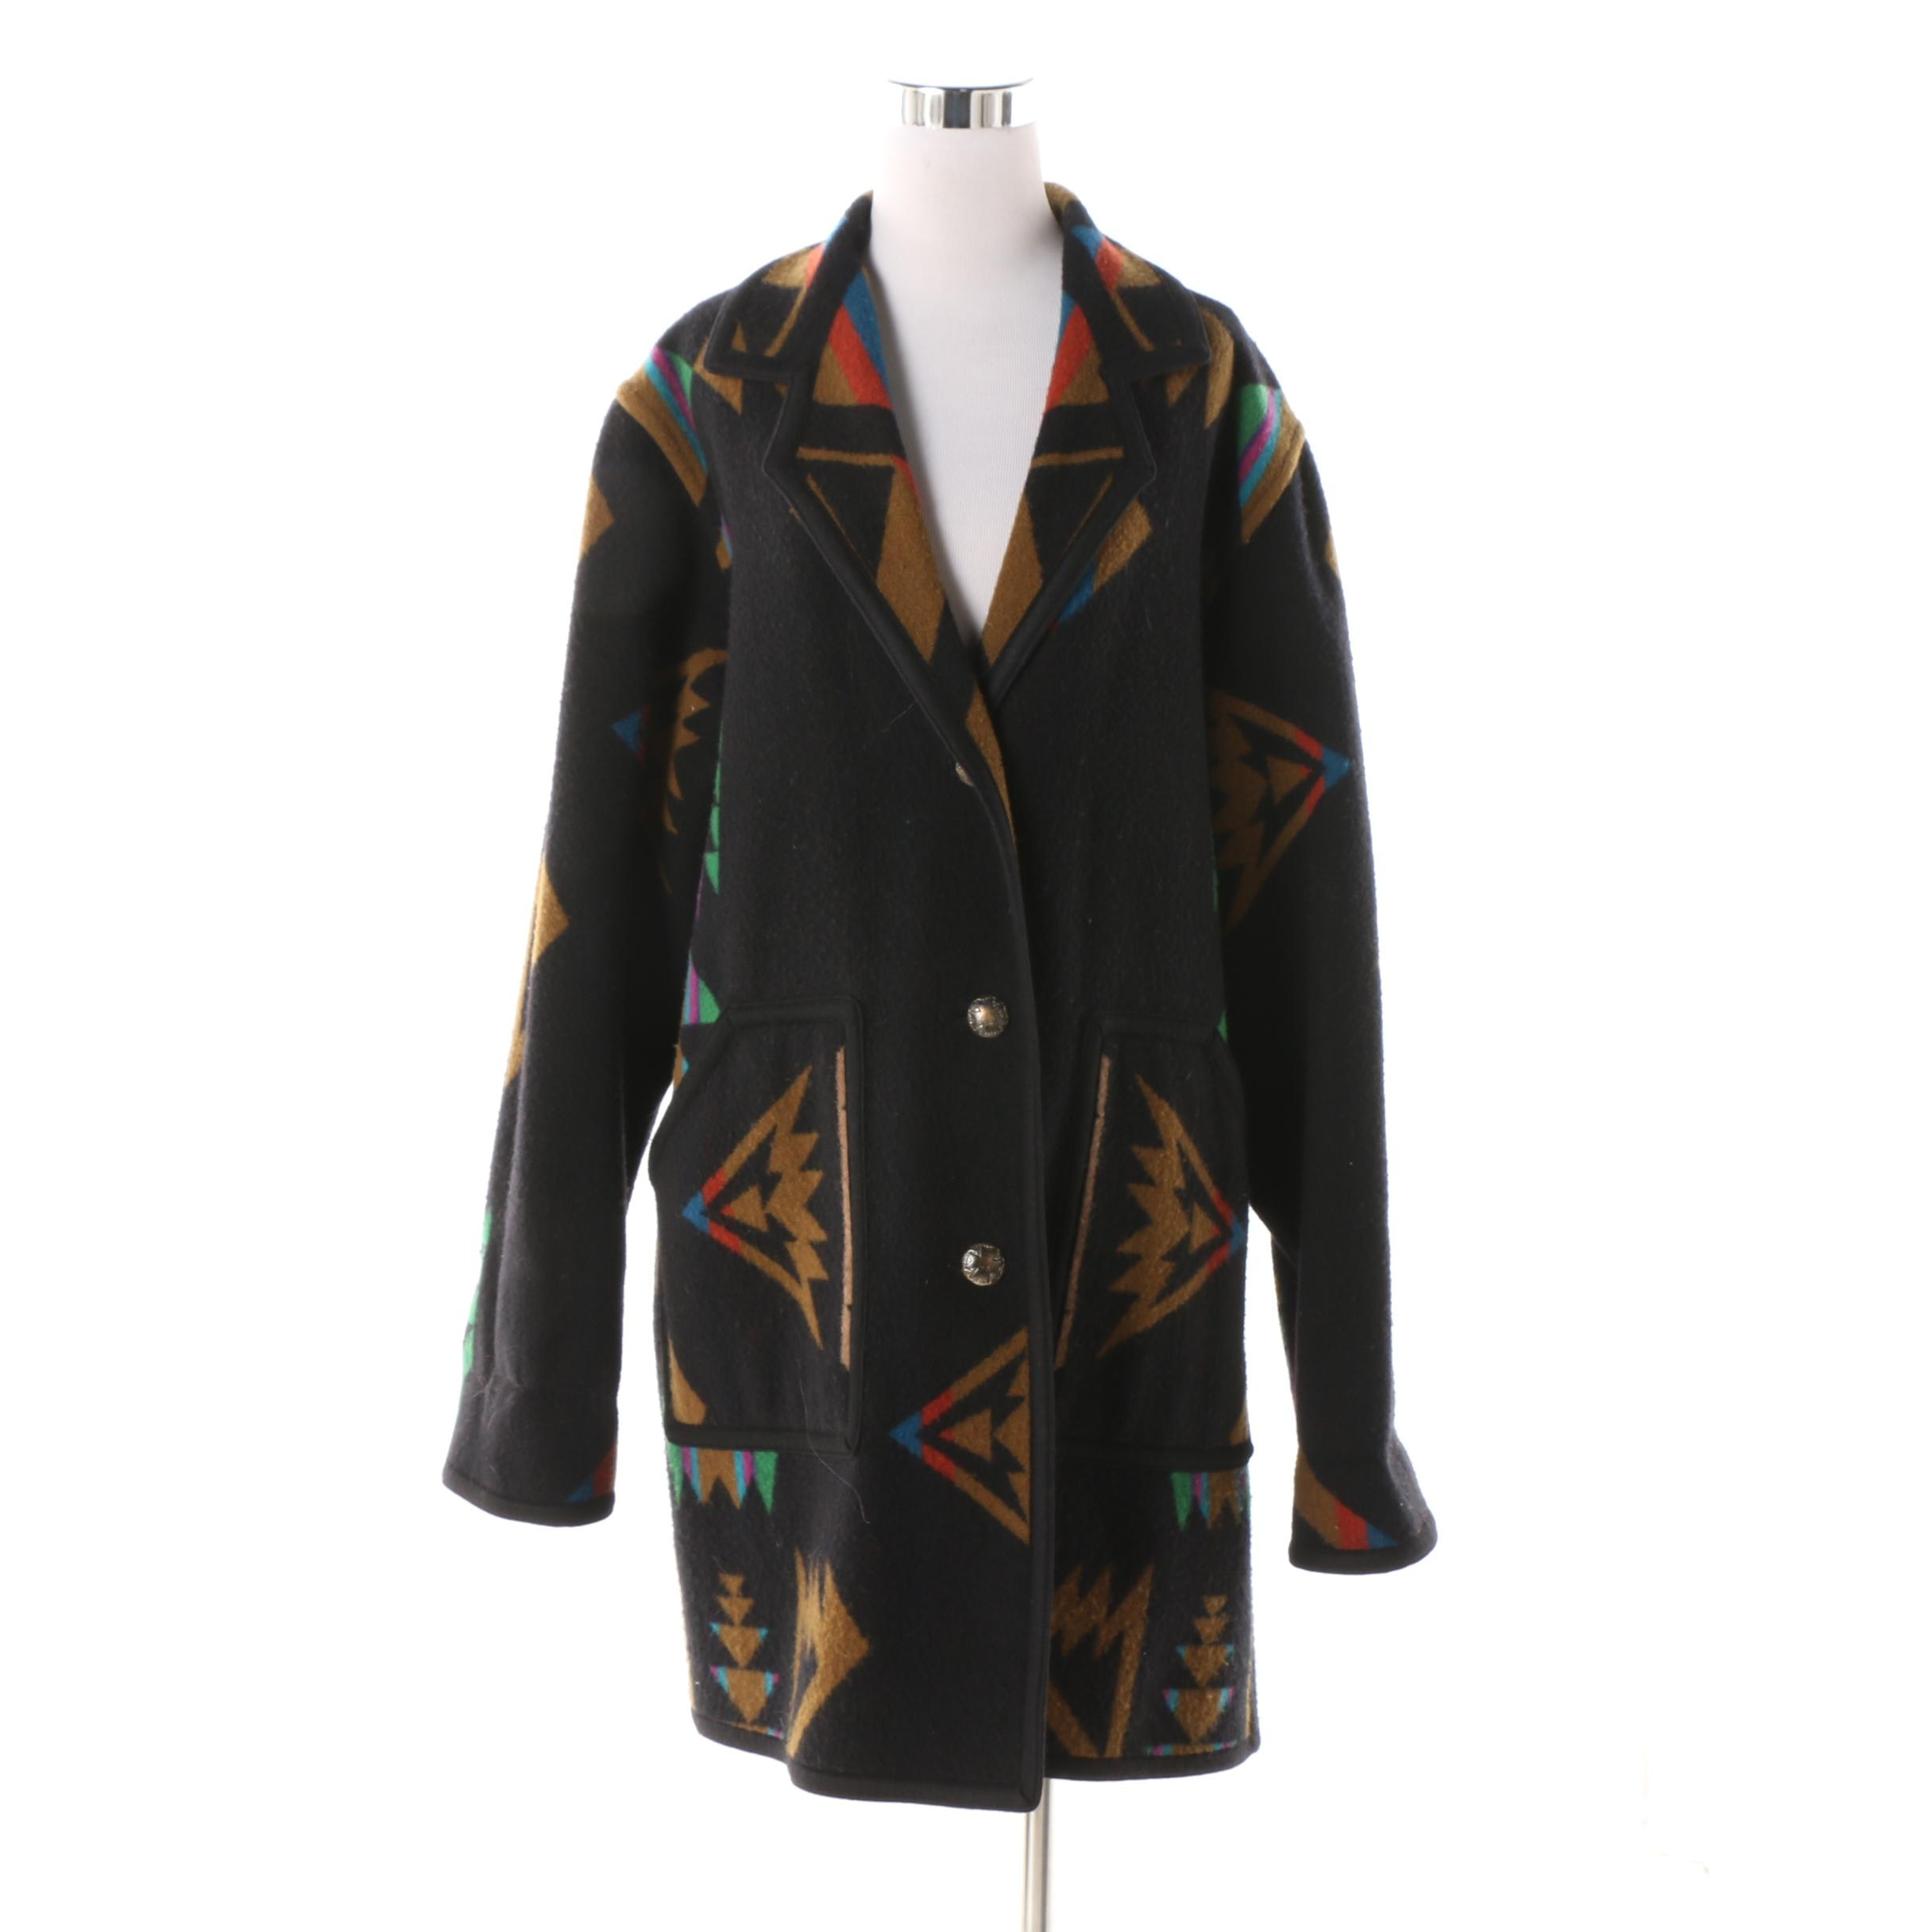 Women's Circa 1990 Multicolored Wool Blend Southwest Style Reversible Coat